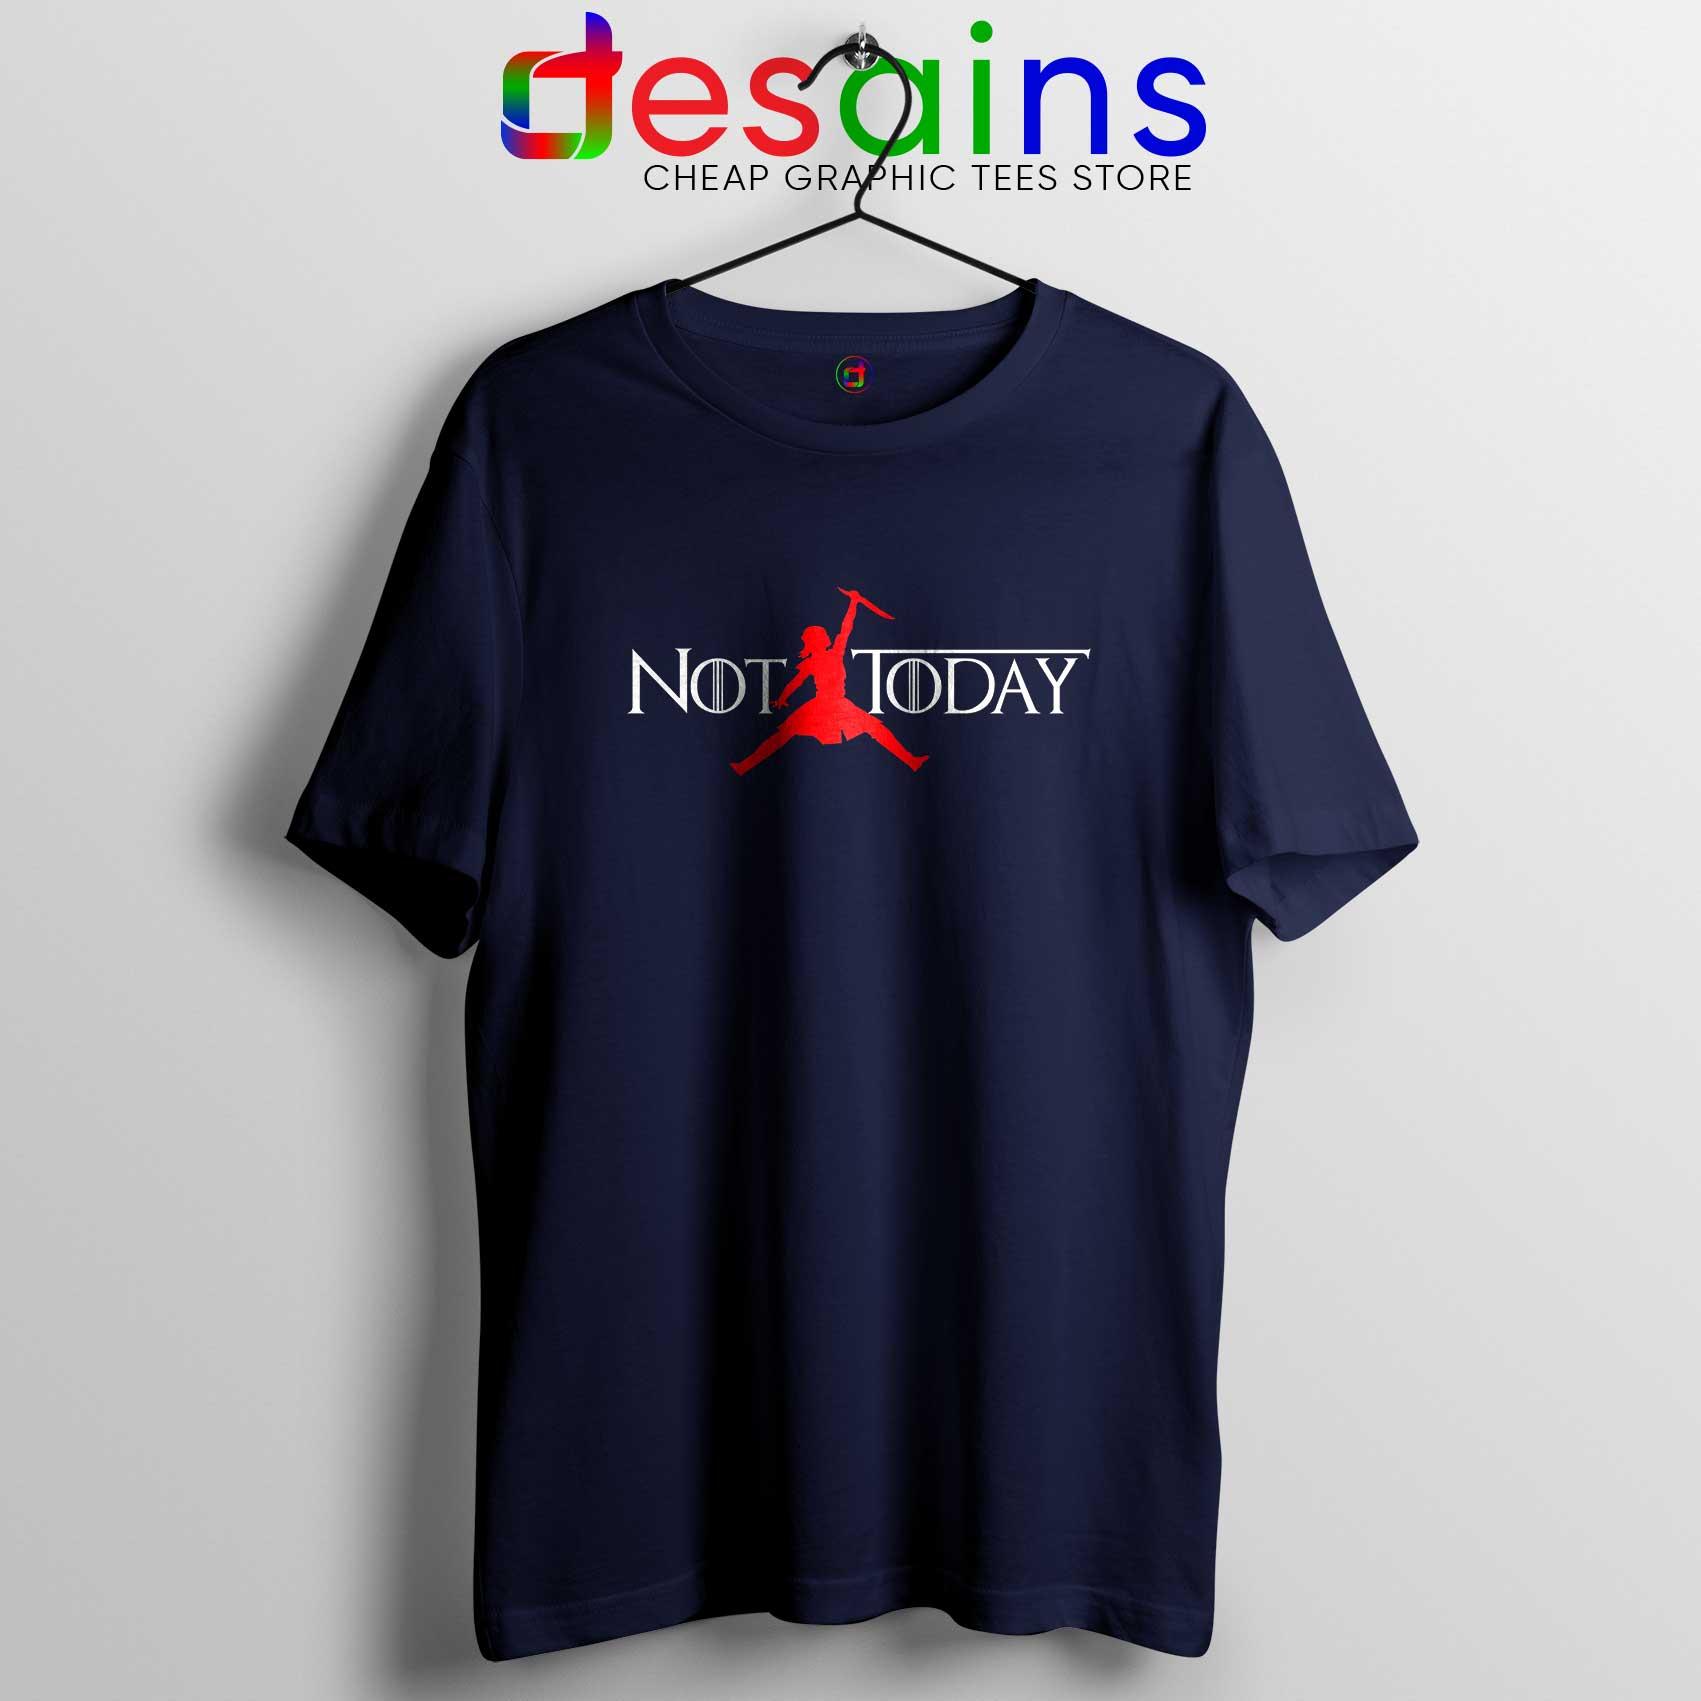 Tee Shirt Air Arya Not Today Game Of Thrones Tshirt Nike Parody